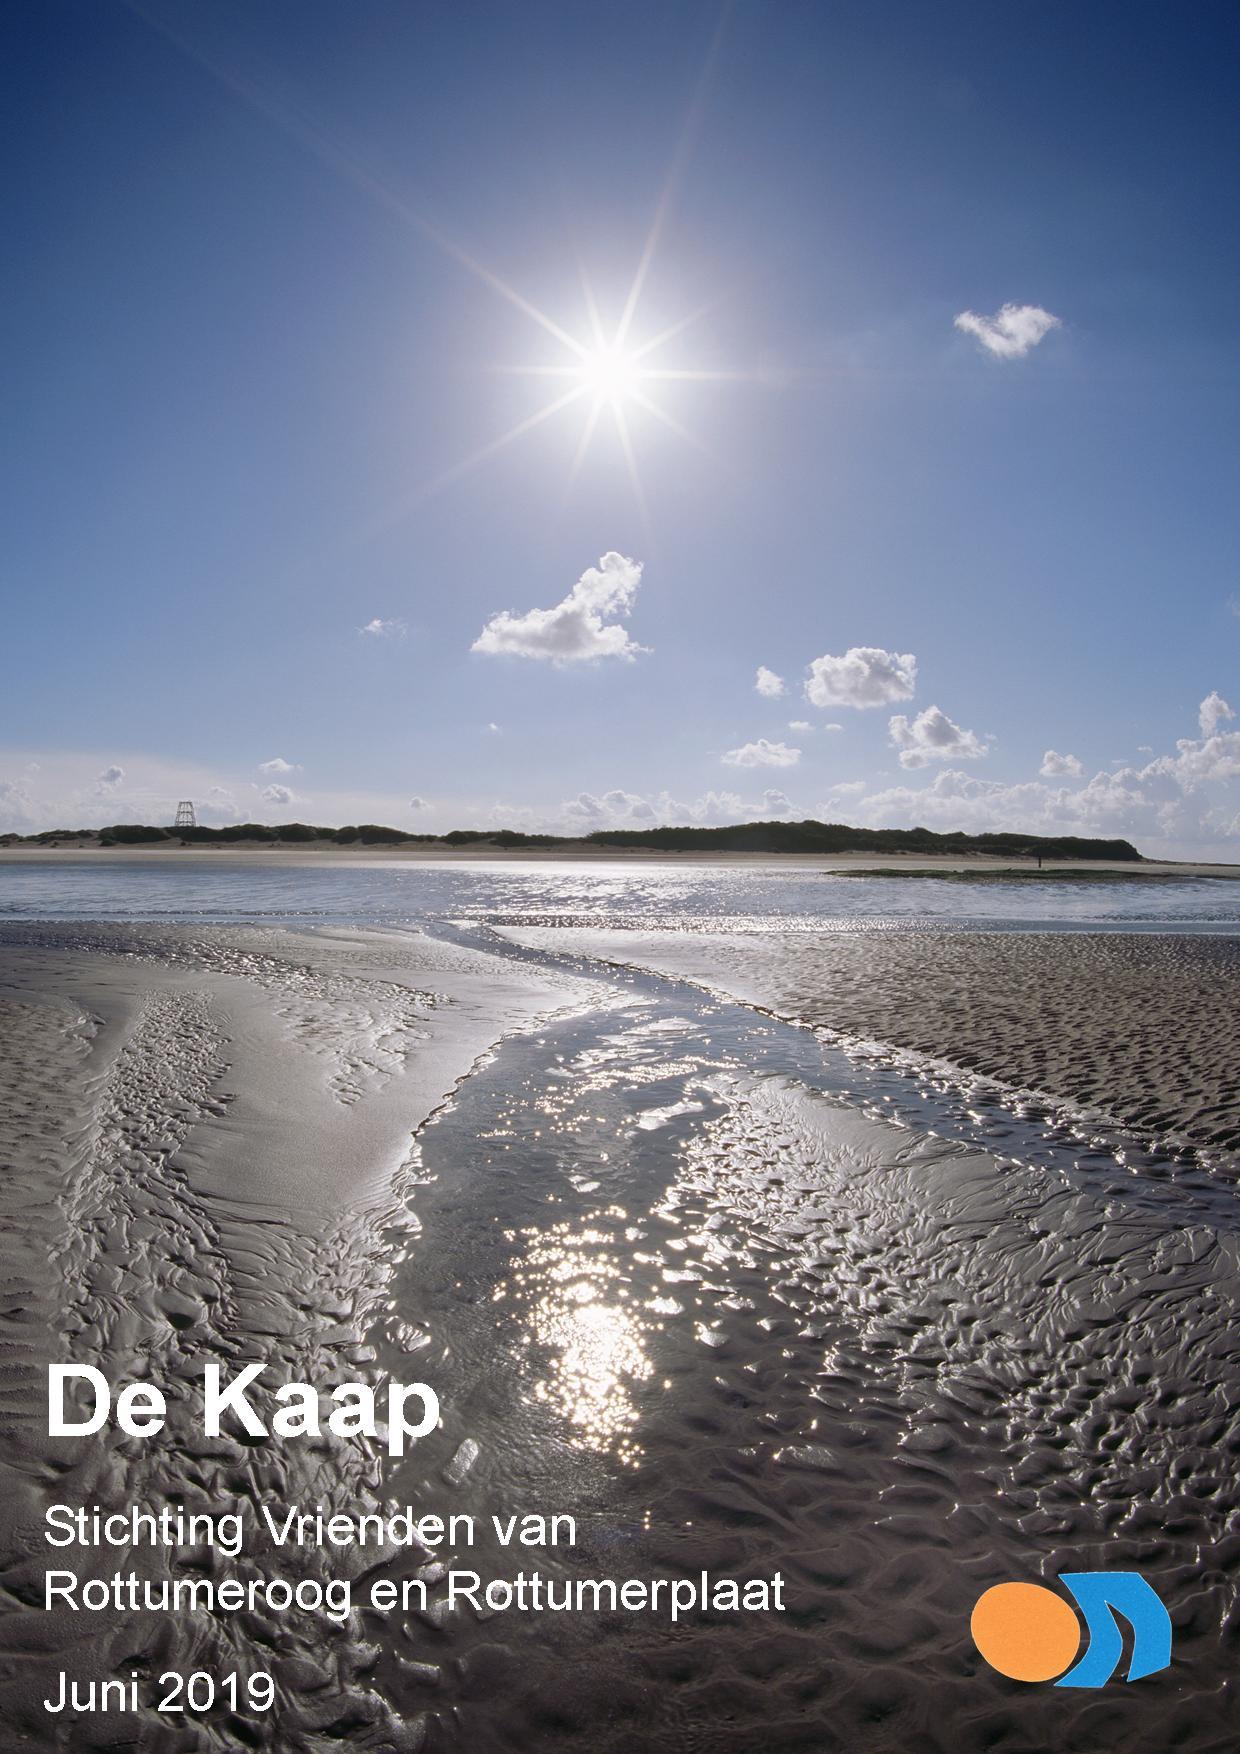 De Kaap juni 2019